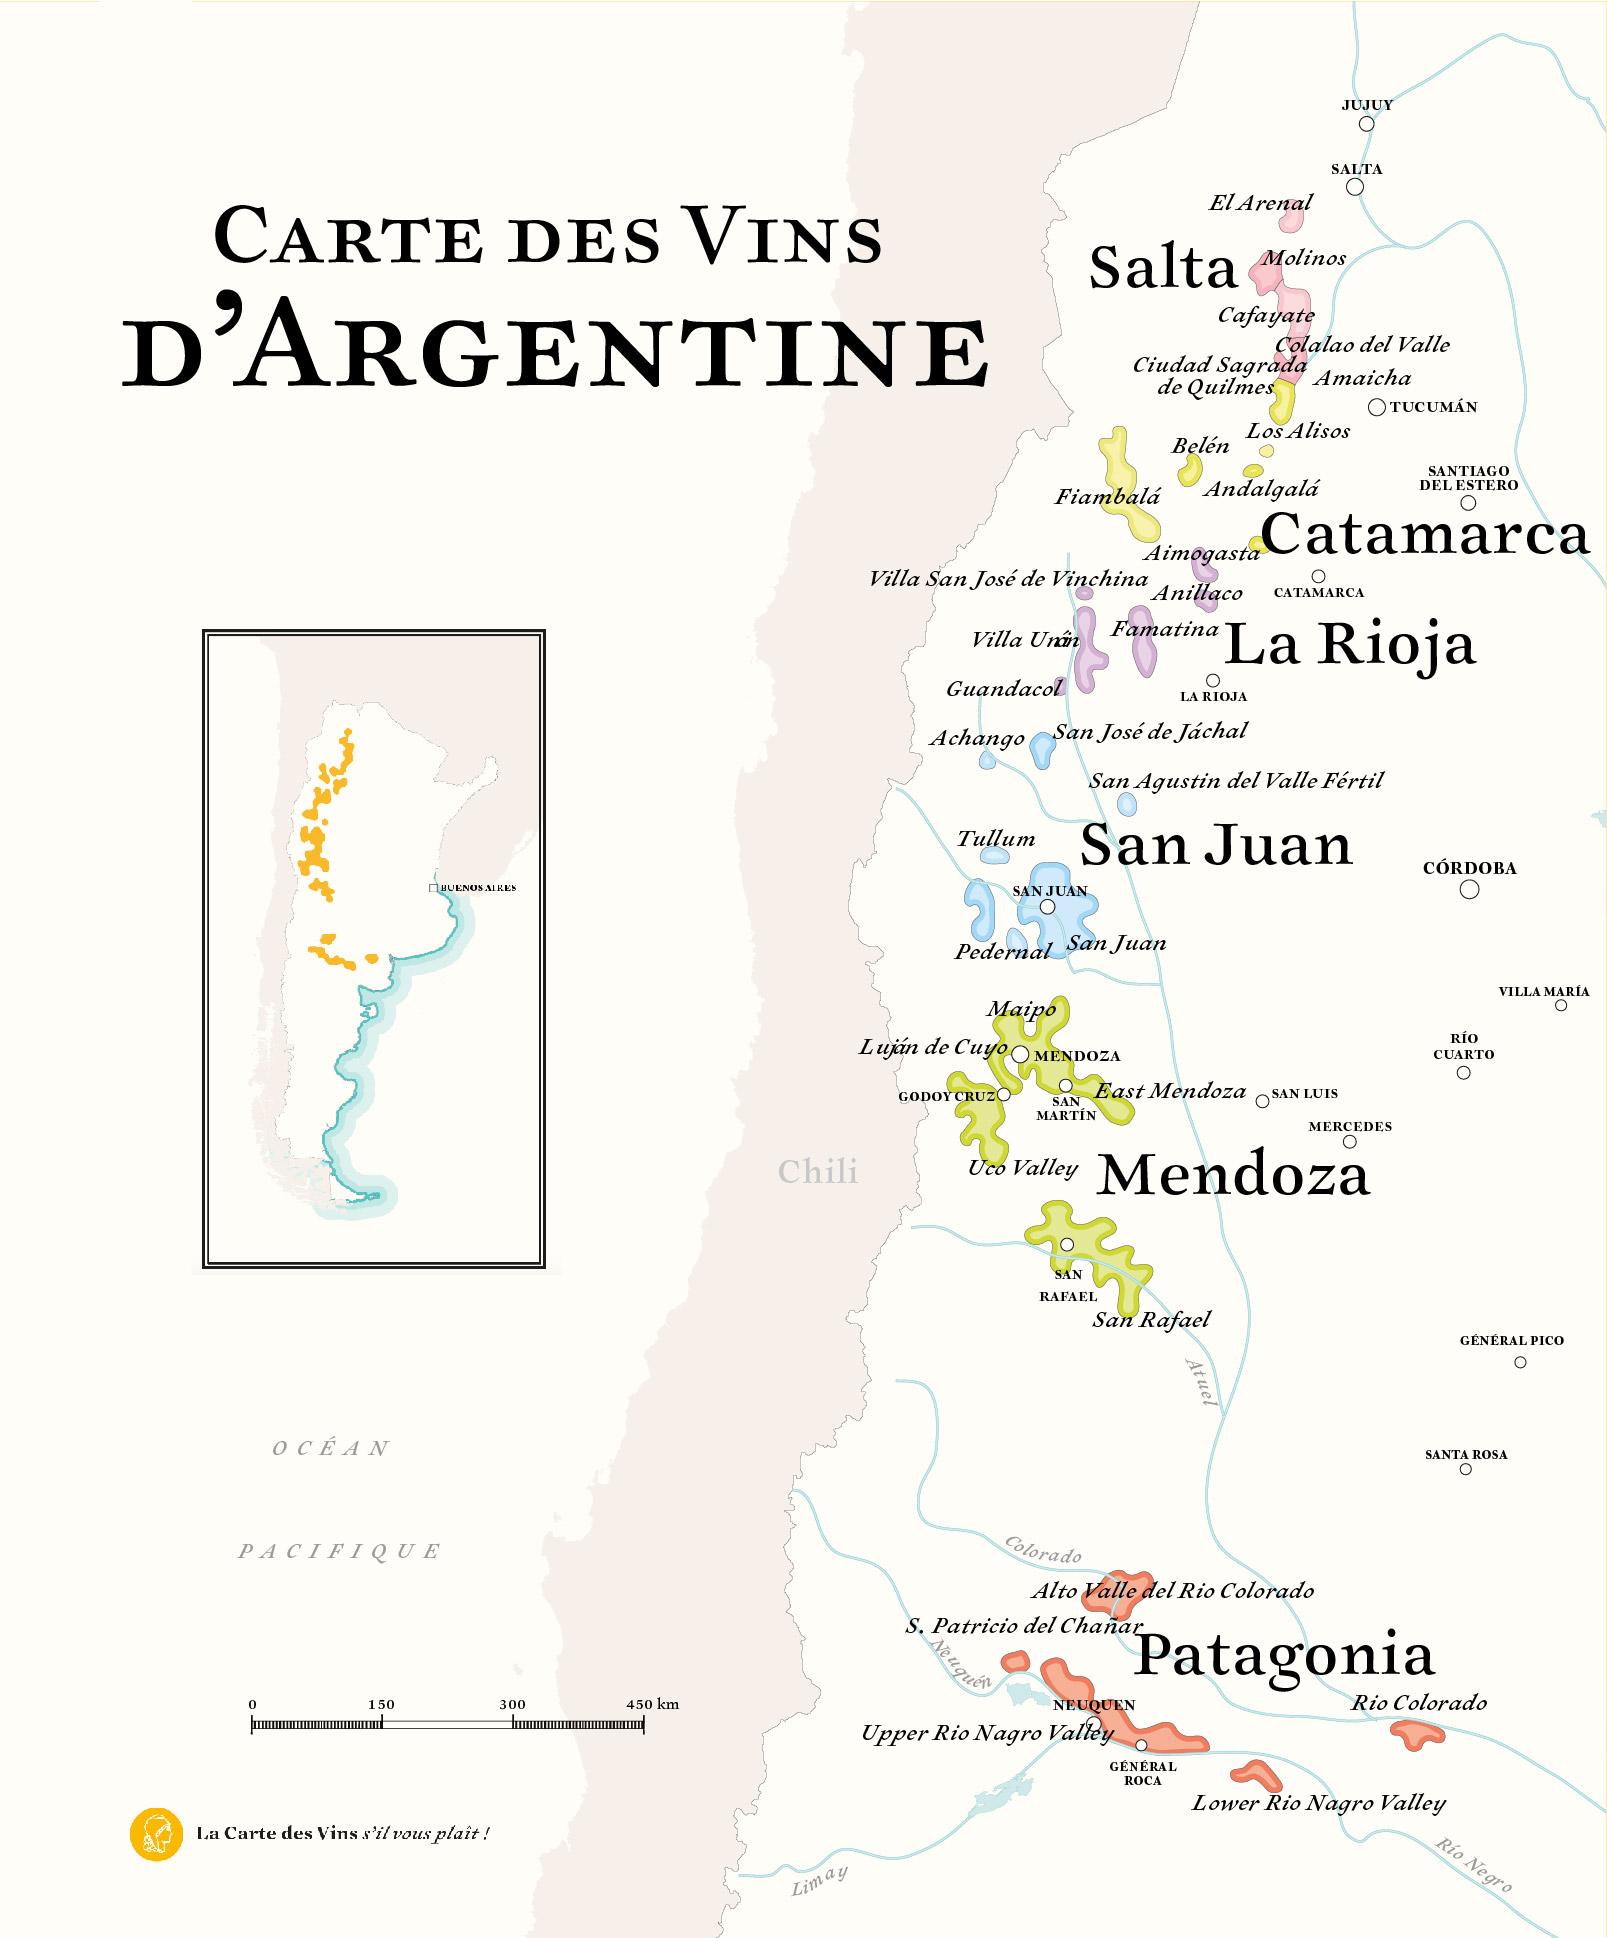 carte-vins-argentine-wine-map-argentina